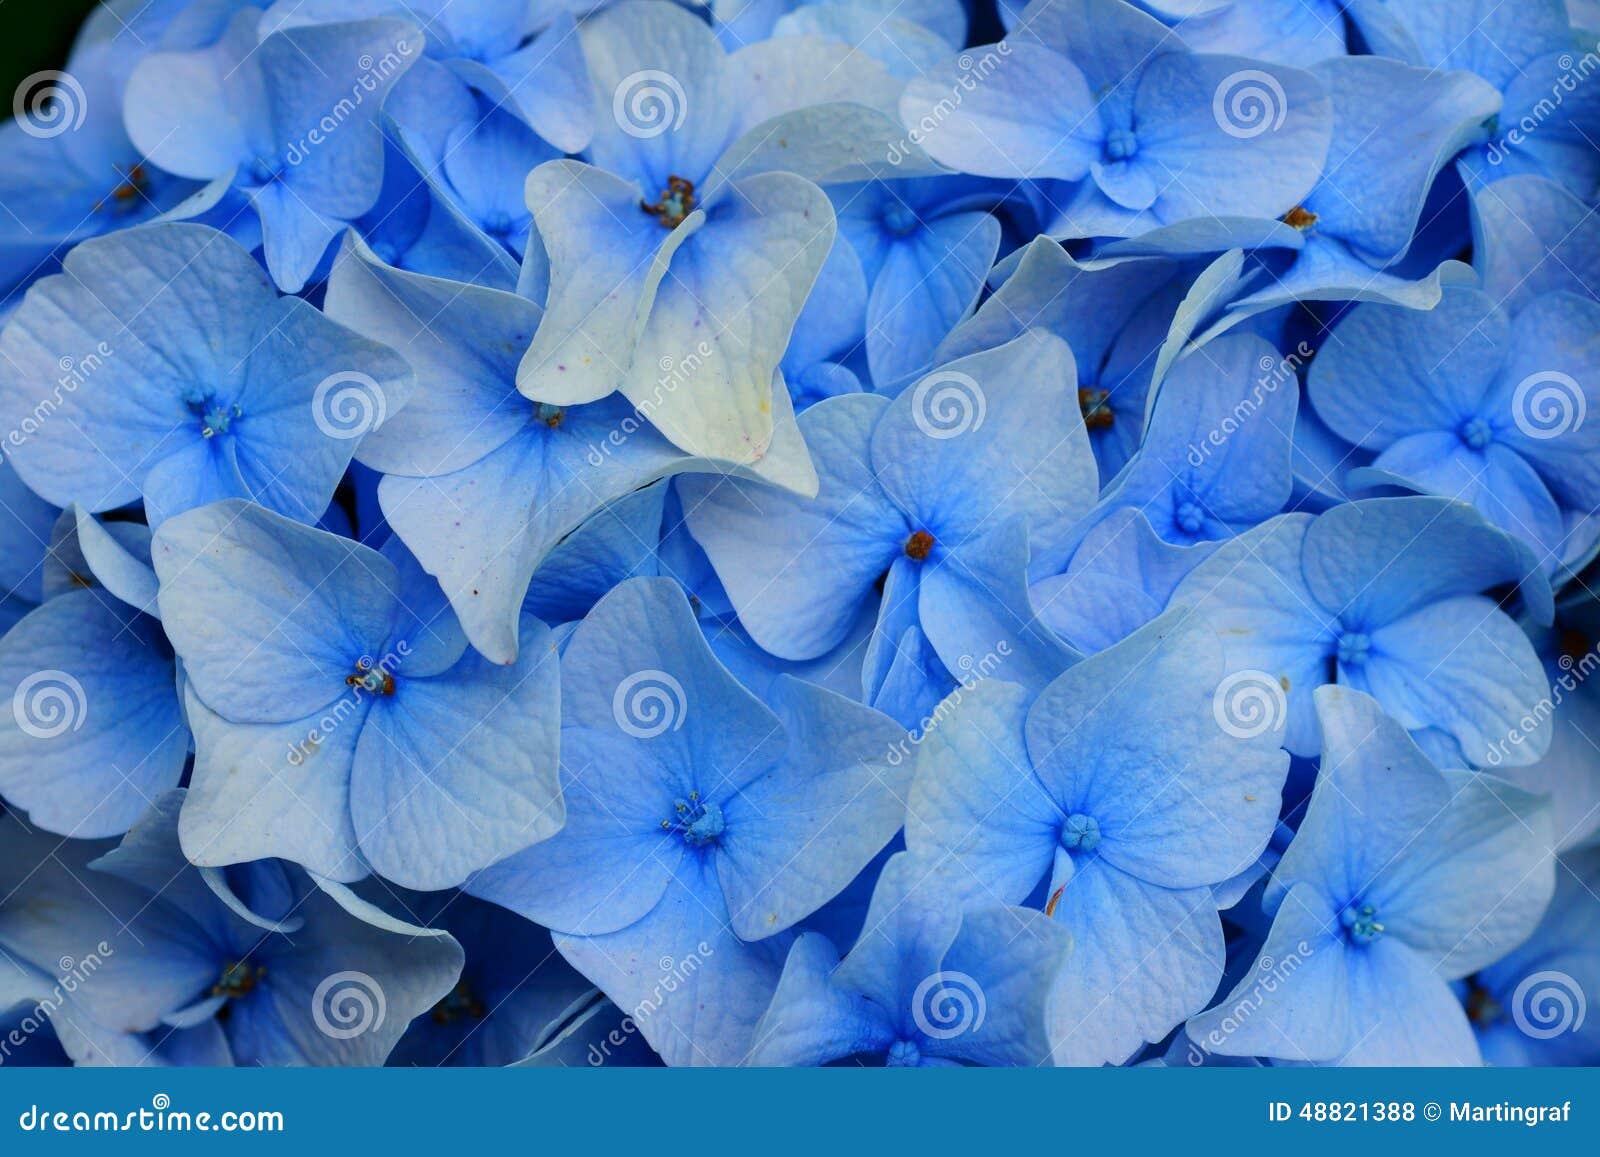 Fleurs Bleu-clair De Hortensia Photo stock - Image: 48821388